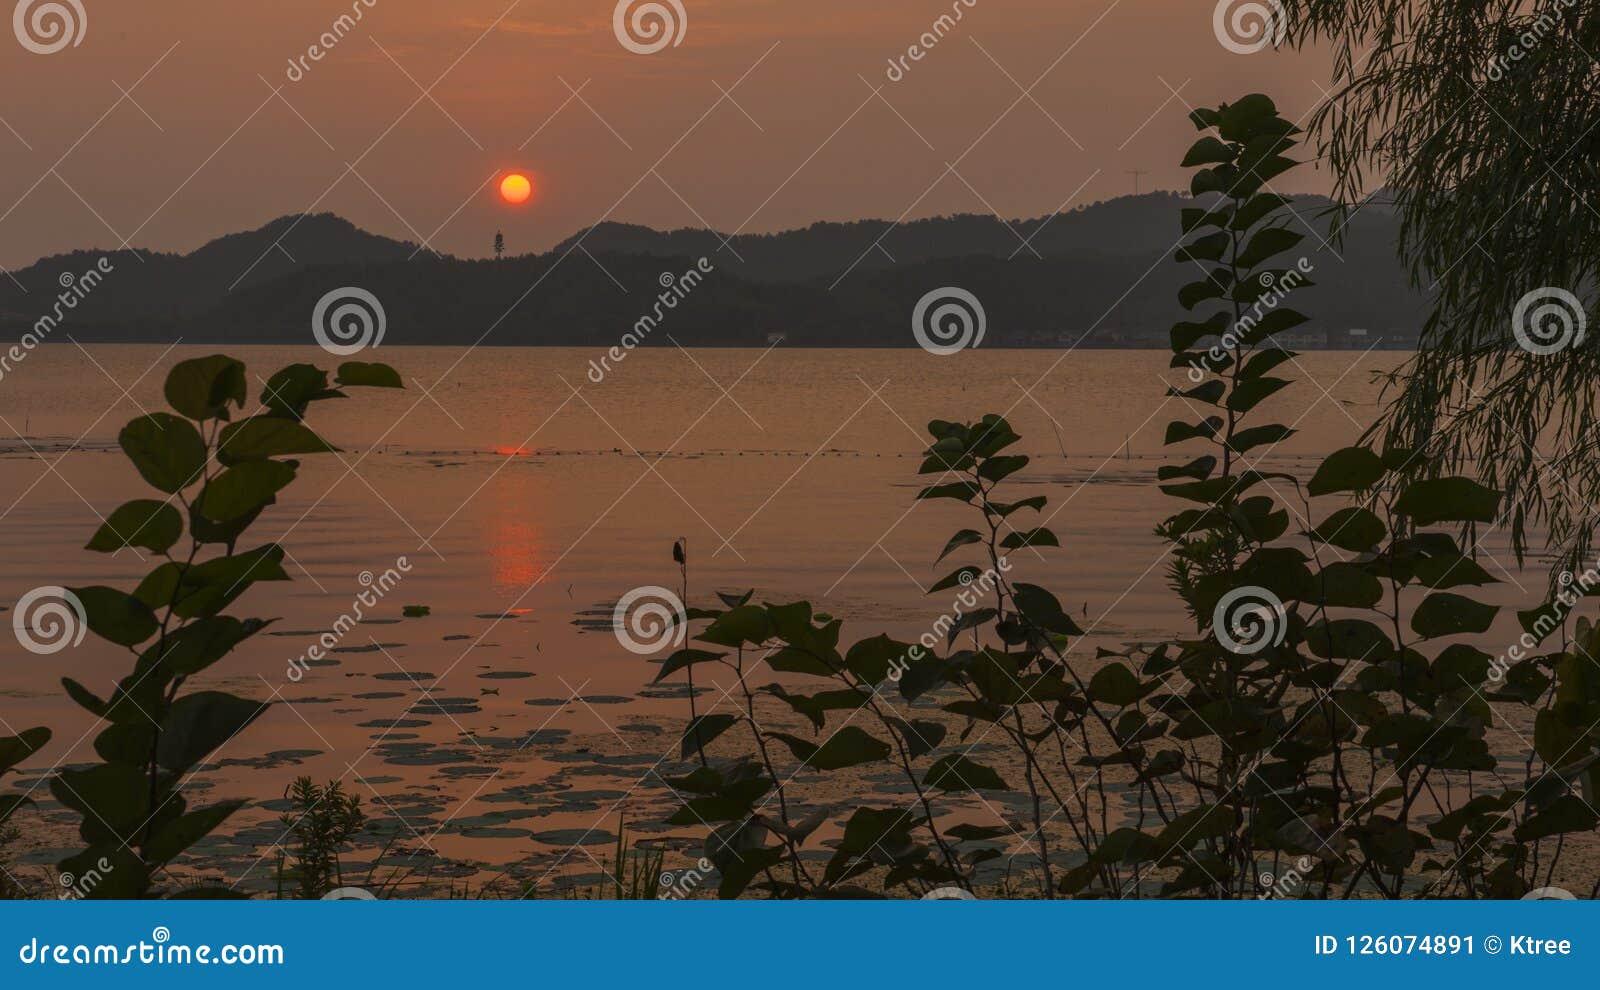 Dongqian Lake in the sunset